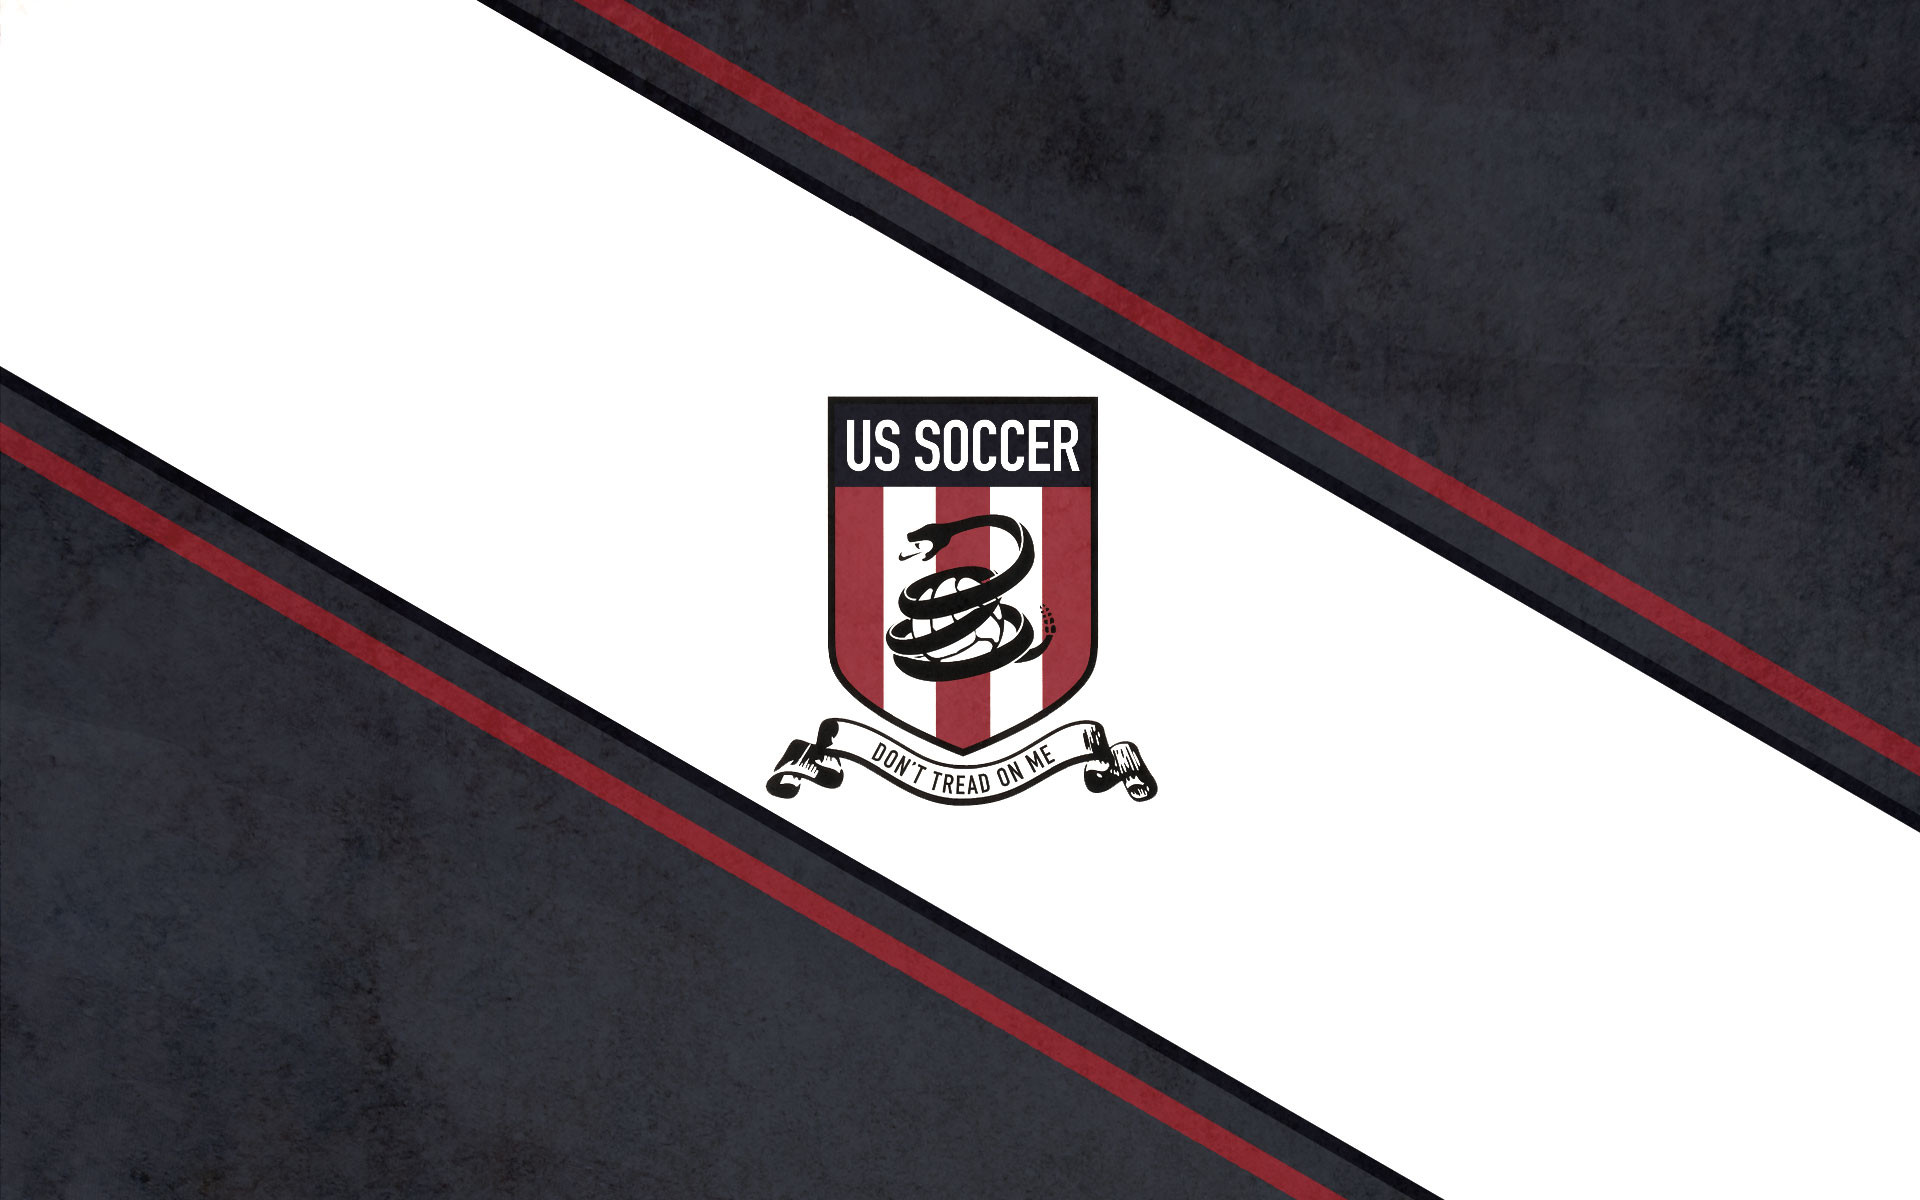 Soccer team logo Wallpaper Backgrounds – Bing Images